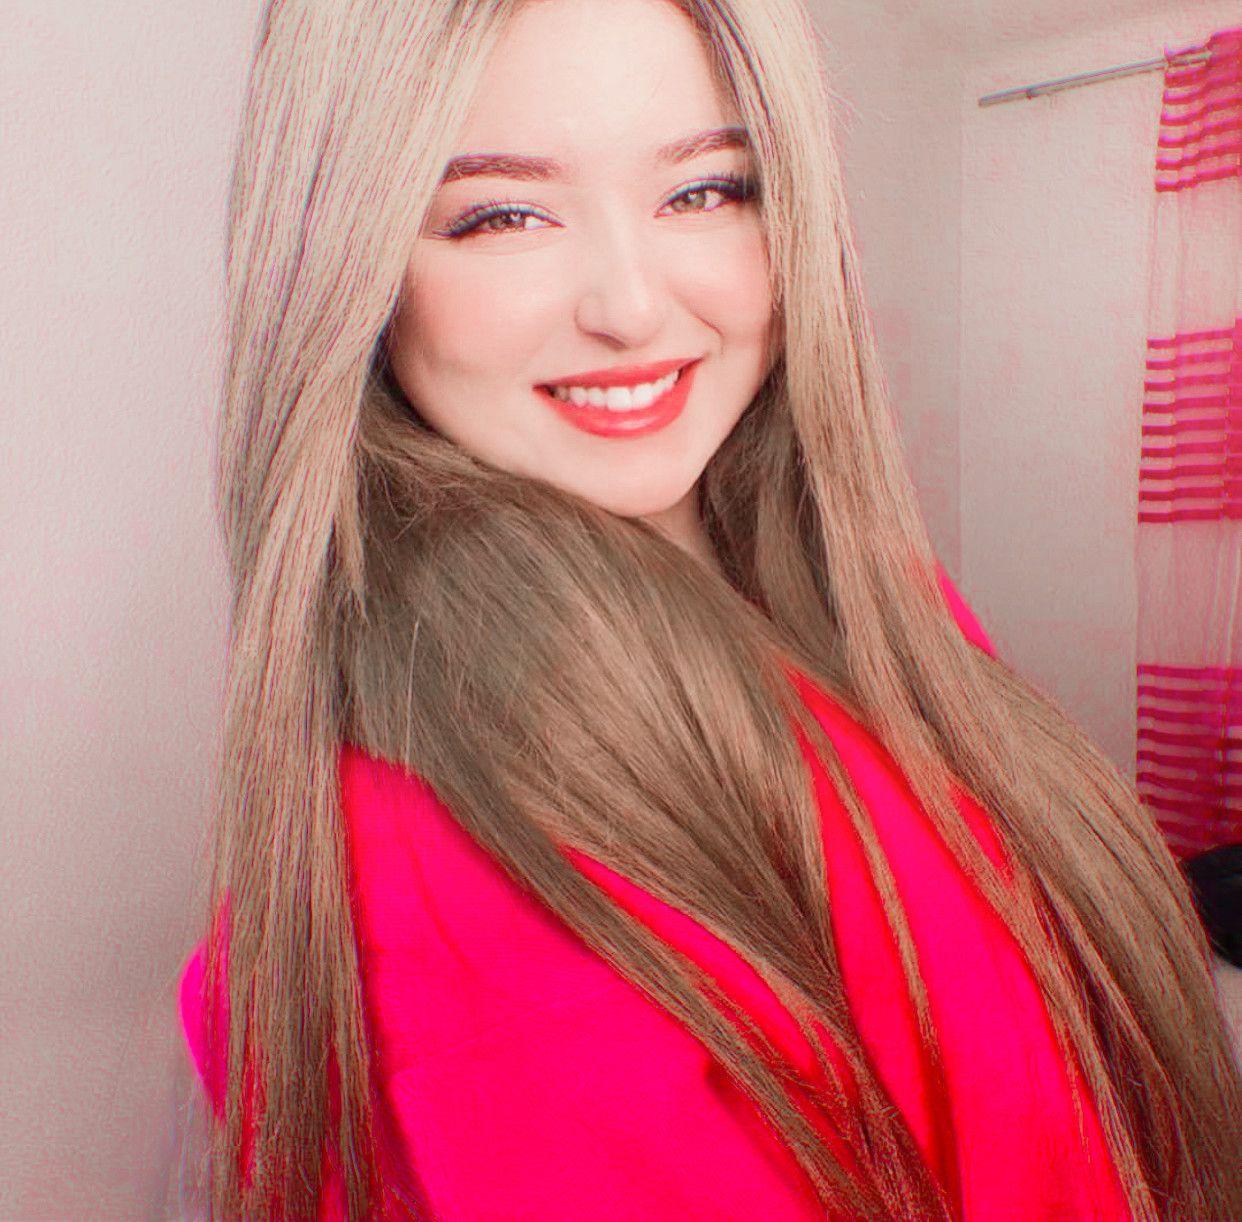 Pin By Hhgfgy On K Ash Blonde Balayage Pretty Blonde Girls Aesthetic Hair